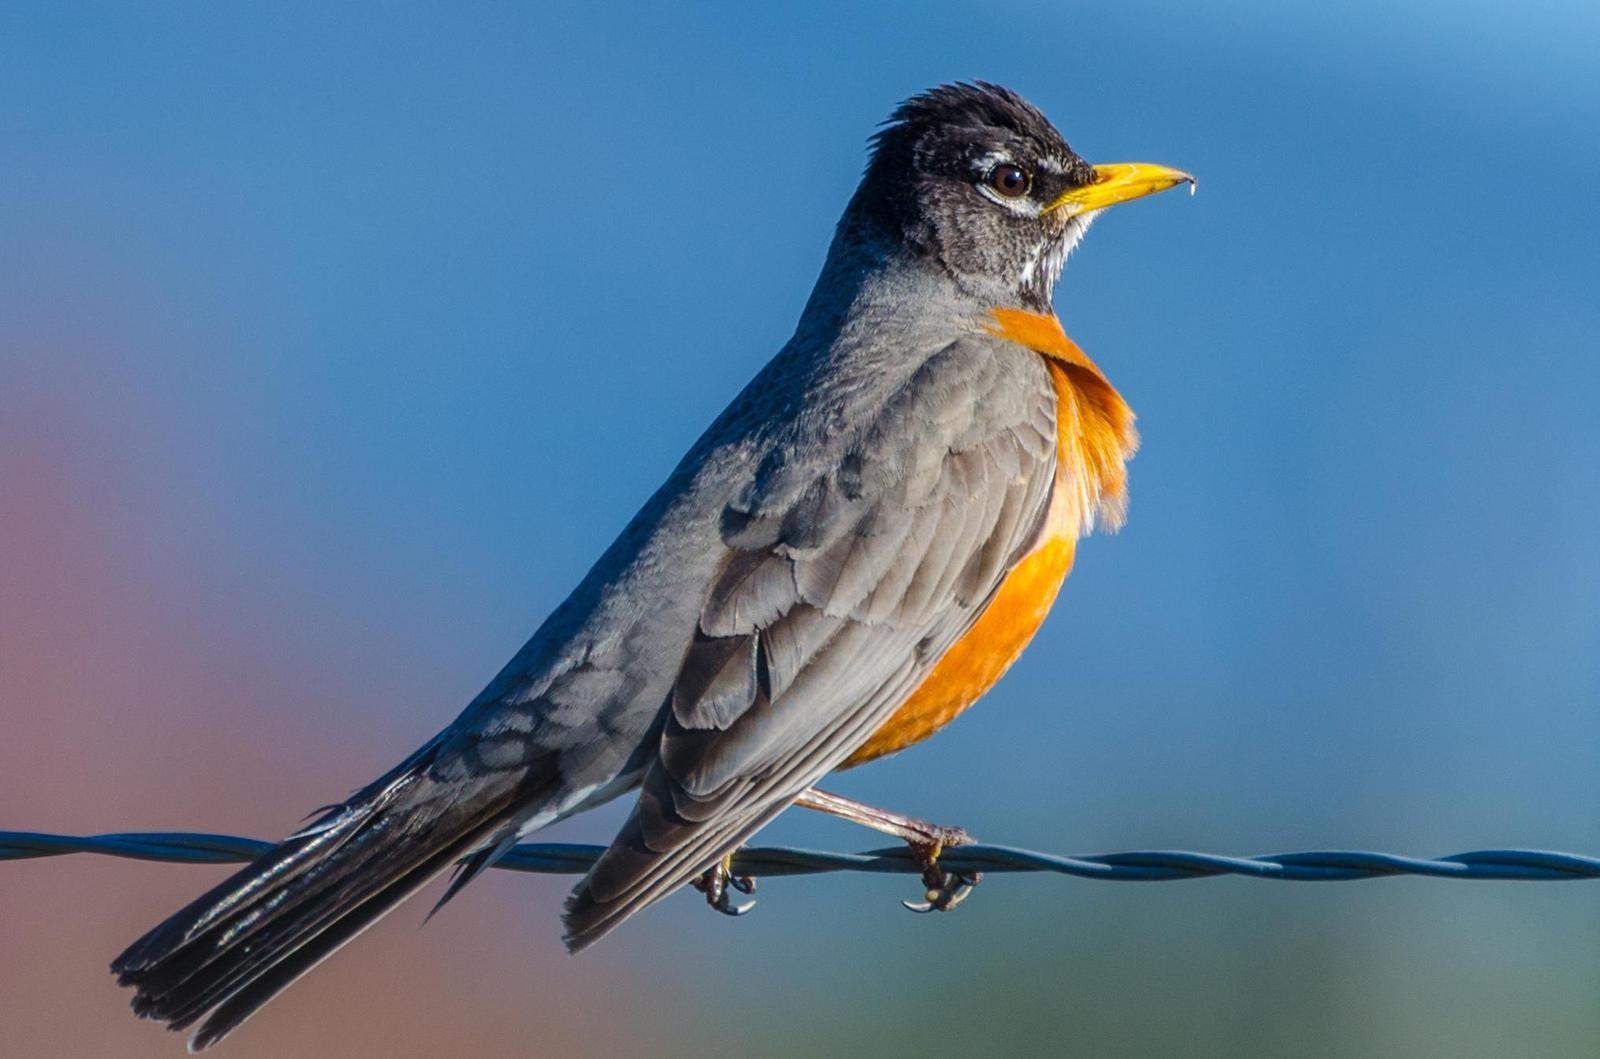 American Robin Photo by Scott Yerges